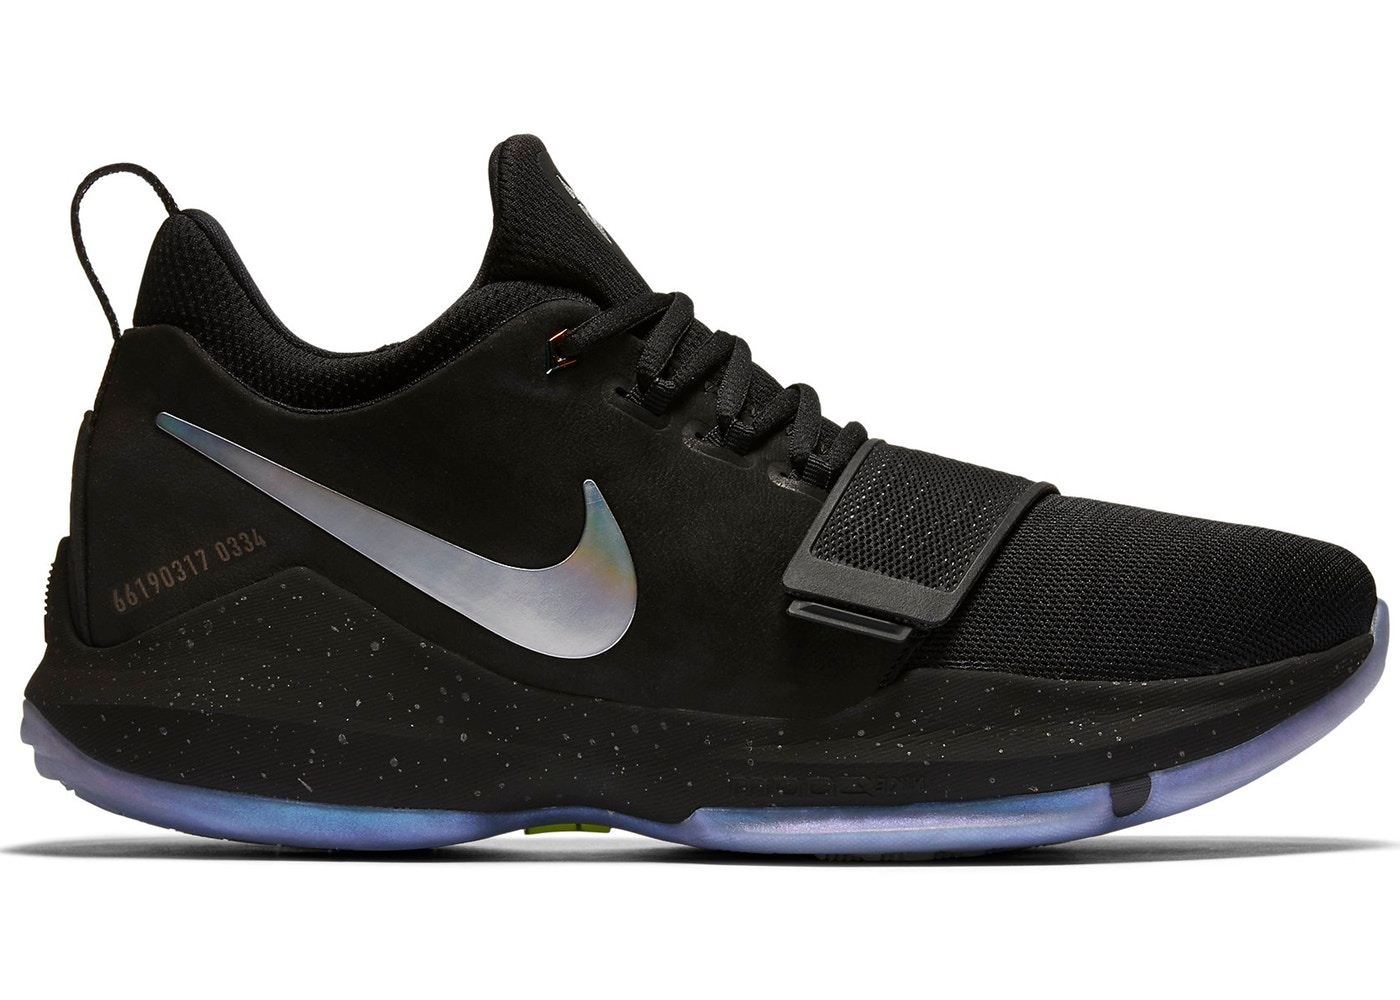 super popular 84a52 a4190 Nike PG 1 Shining